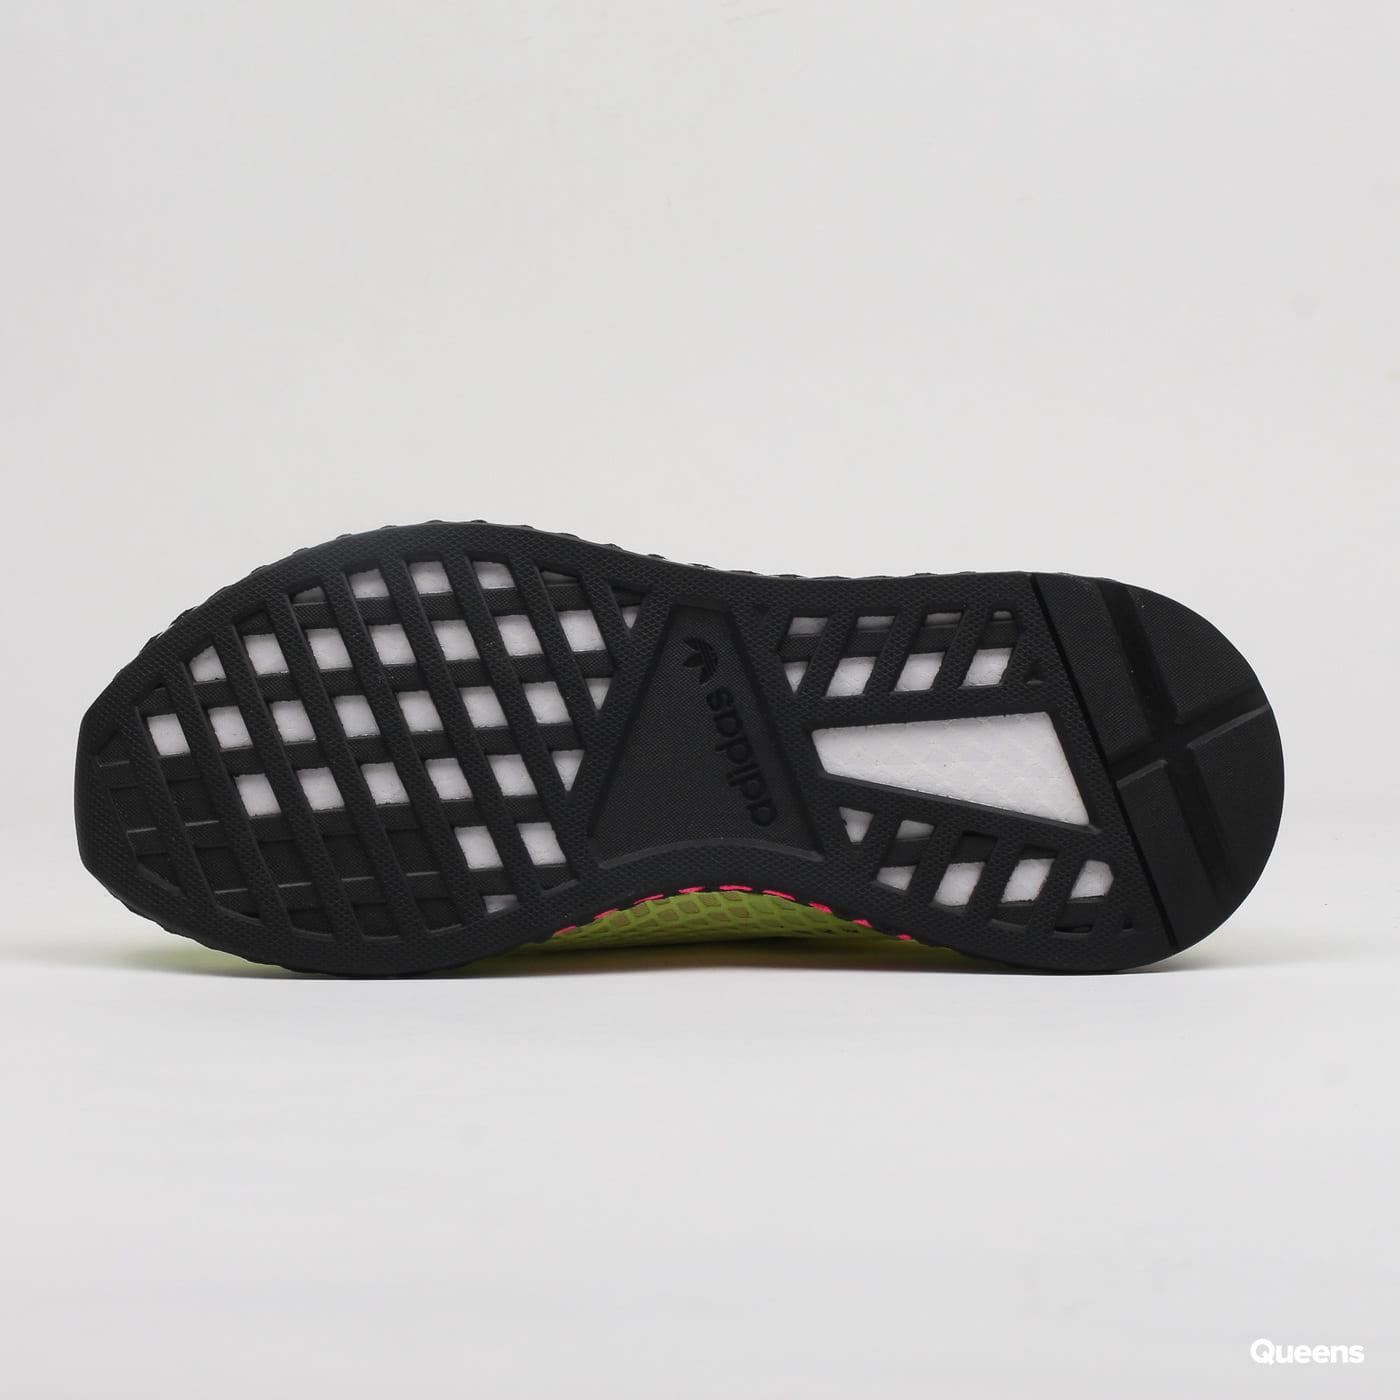 best authentic 3a1bb 54af1 Zoom in Zoom in Zoom in Zoom in Zoom in. adidas Originals Deerupt Runner  hireye   cblack ...